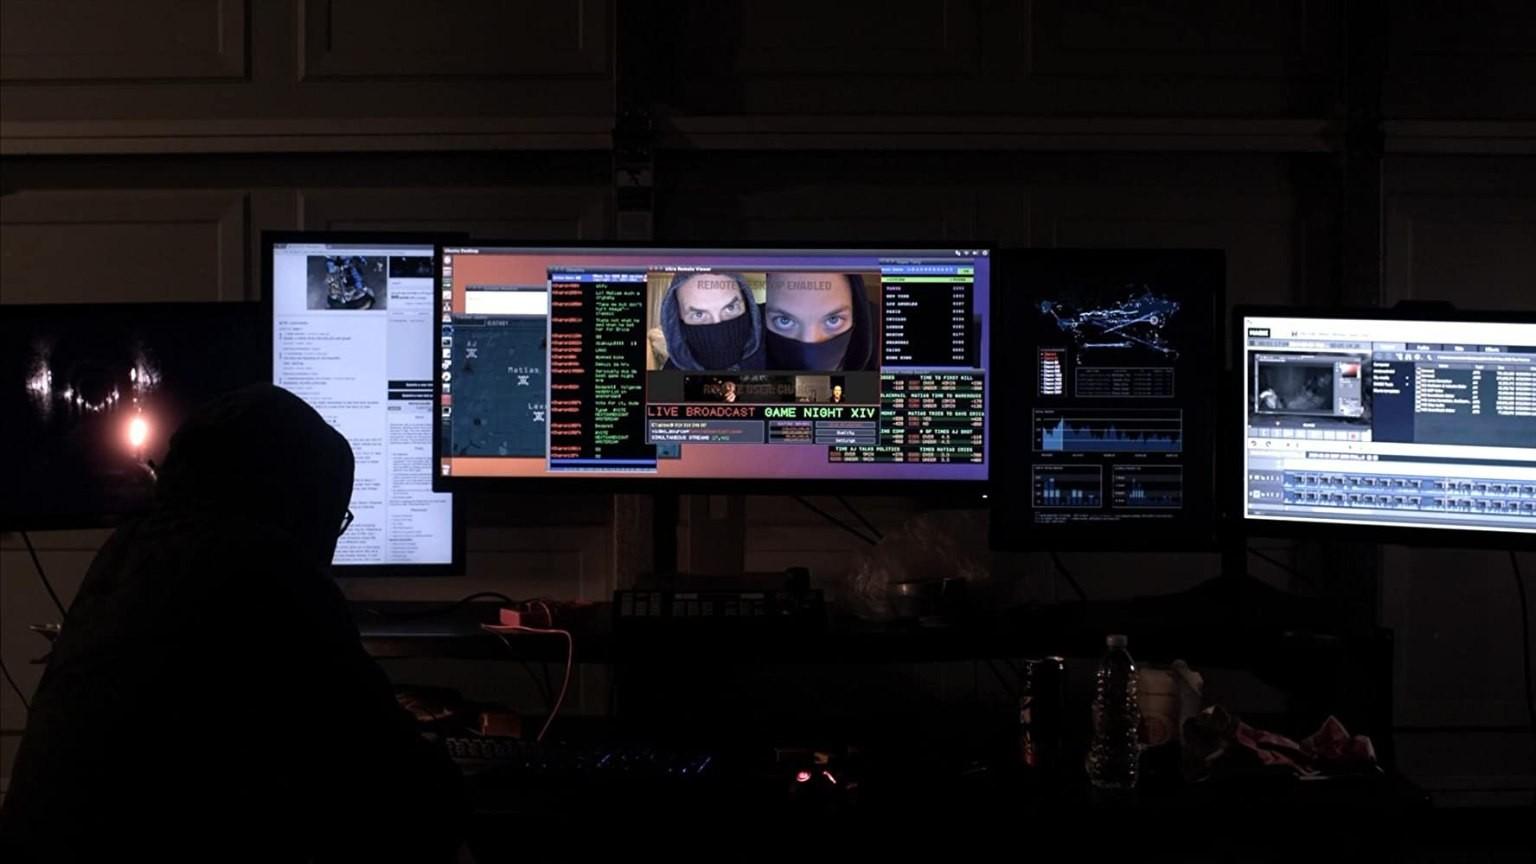 Review phim Unfriended: Dark Web (2018) – Internet thật đáng sợ!